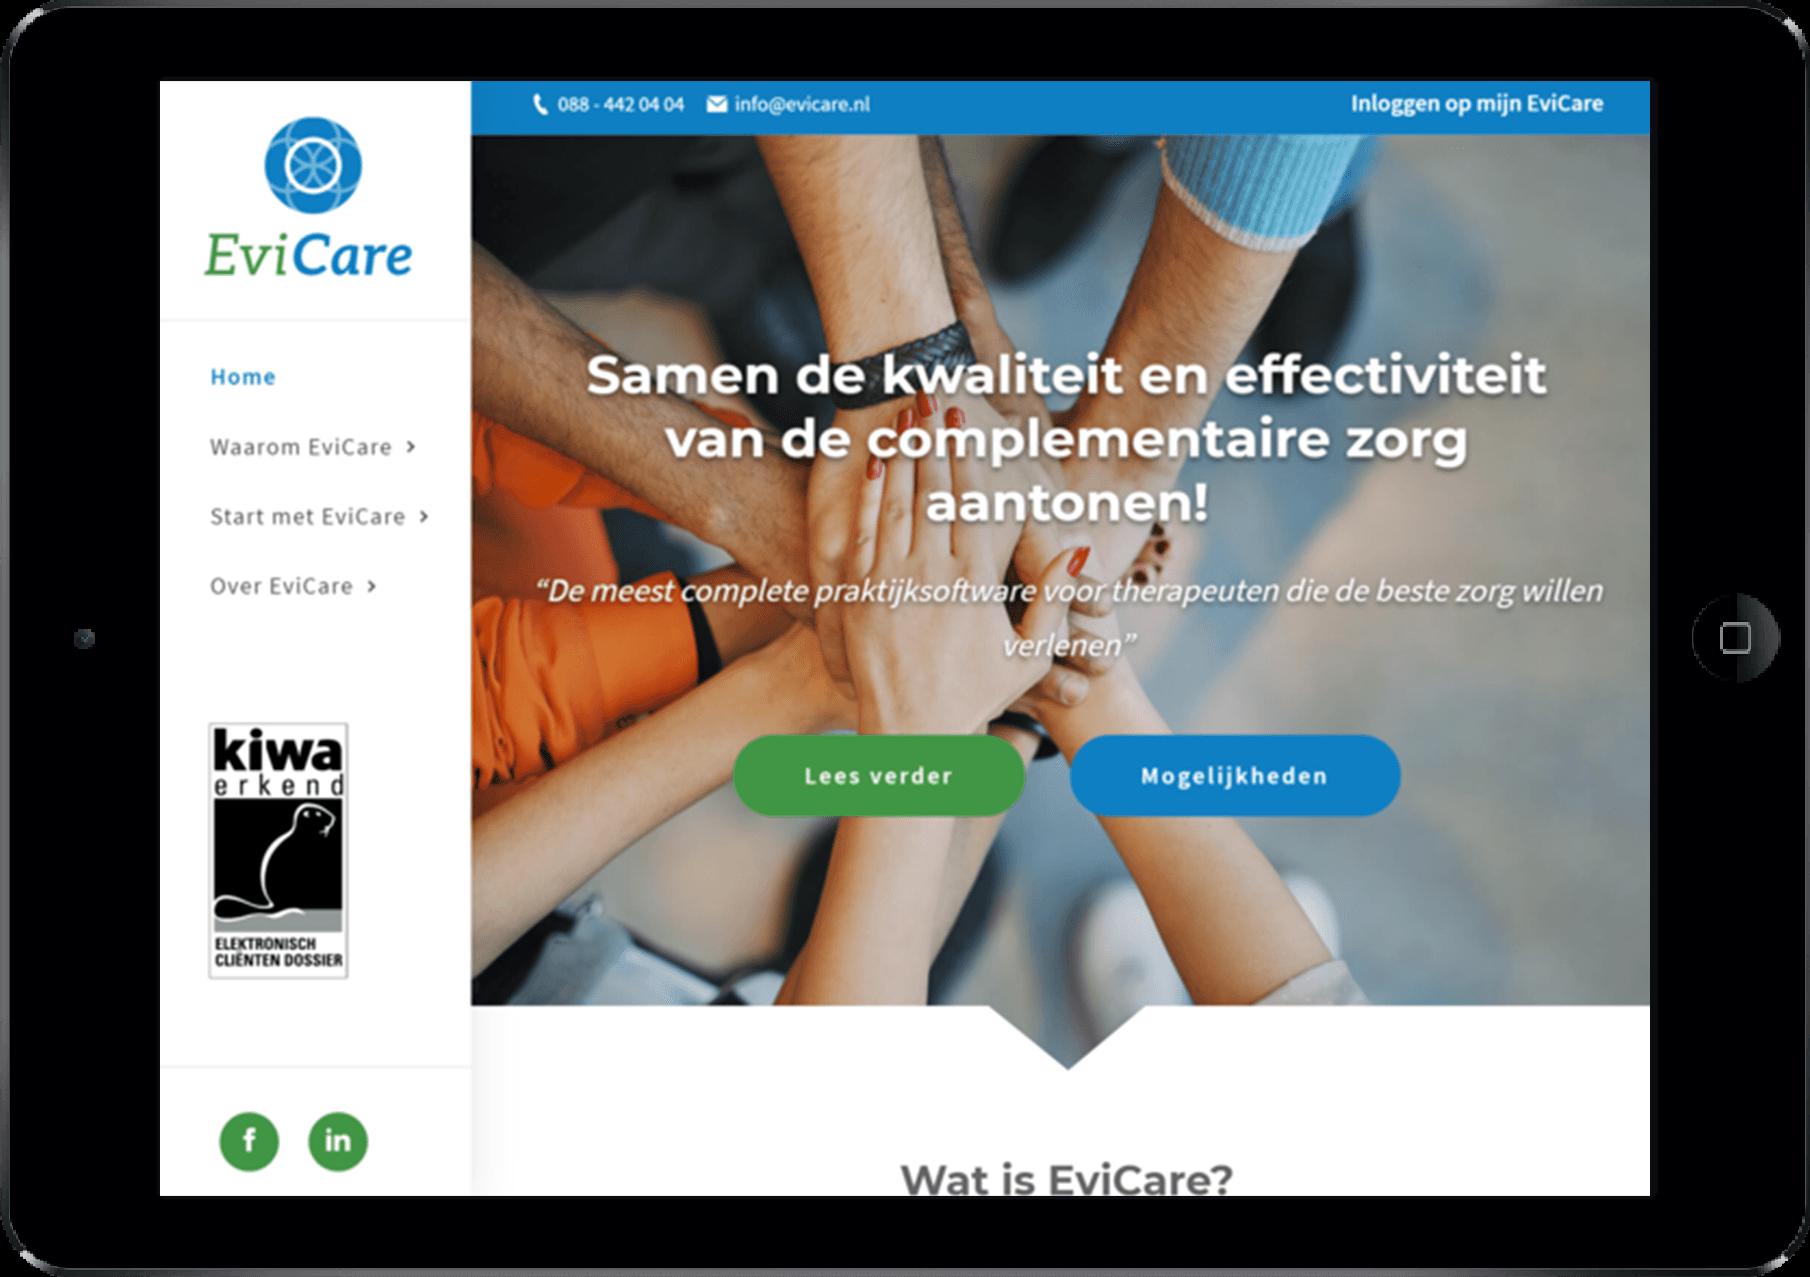 evicare app voor tablets